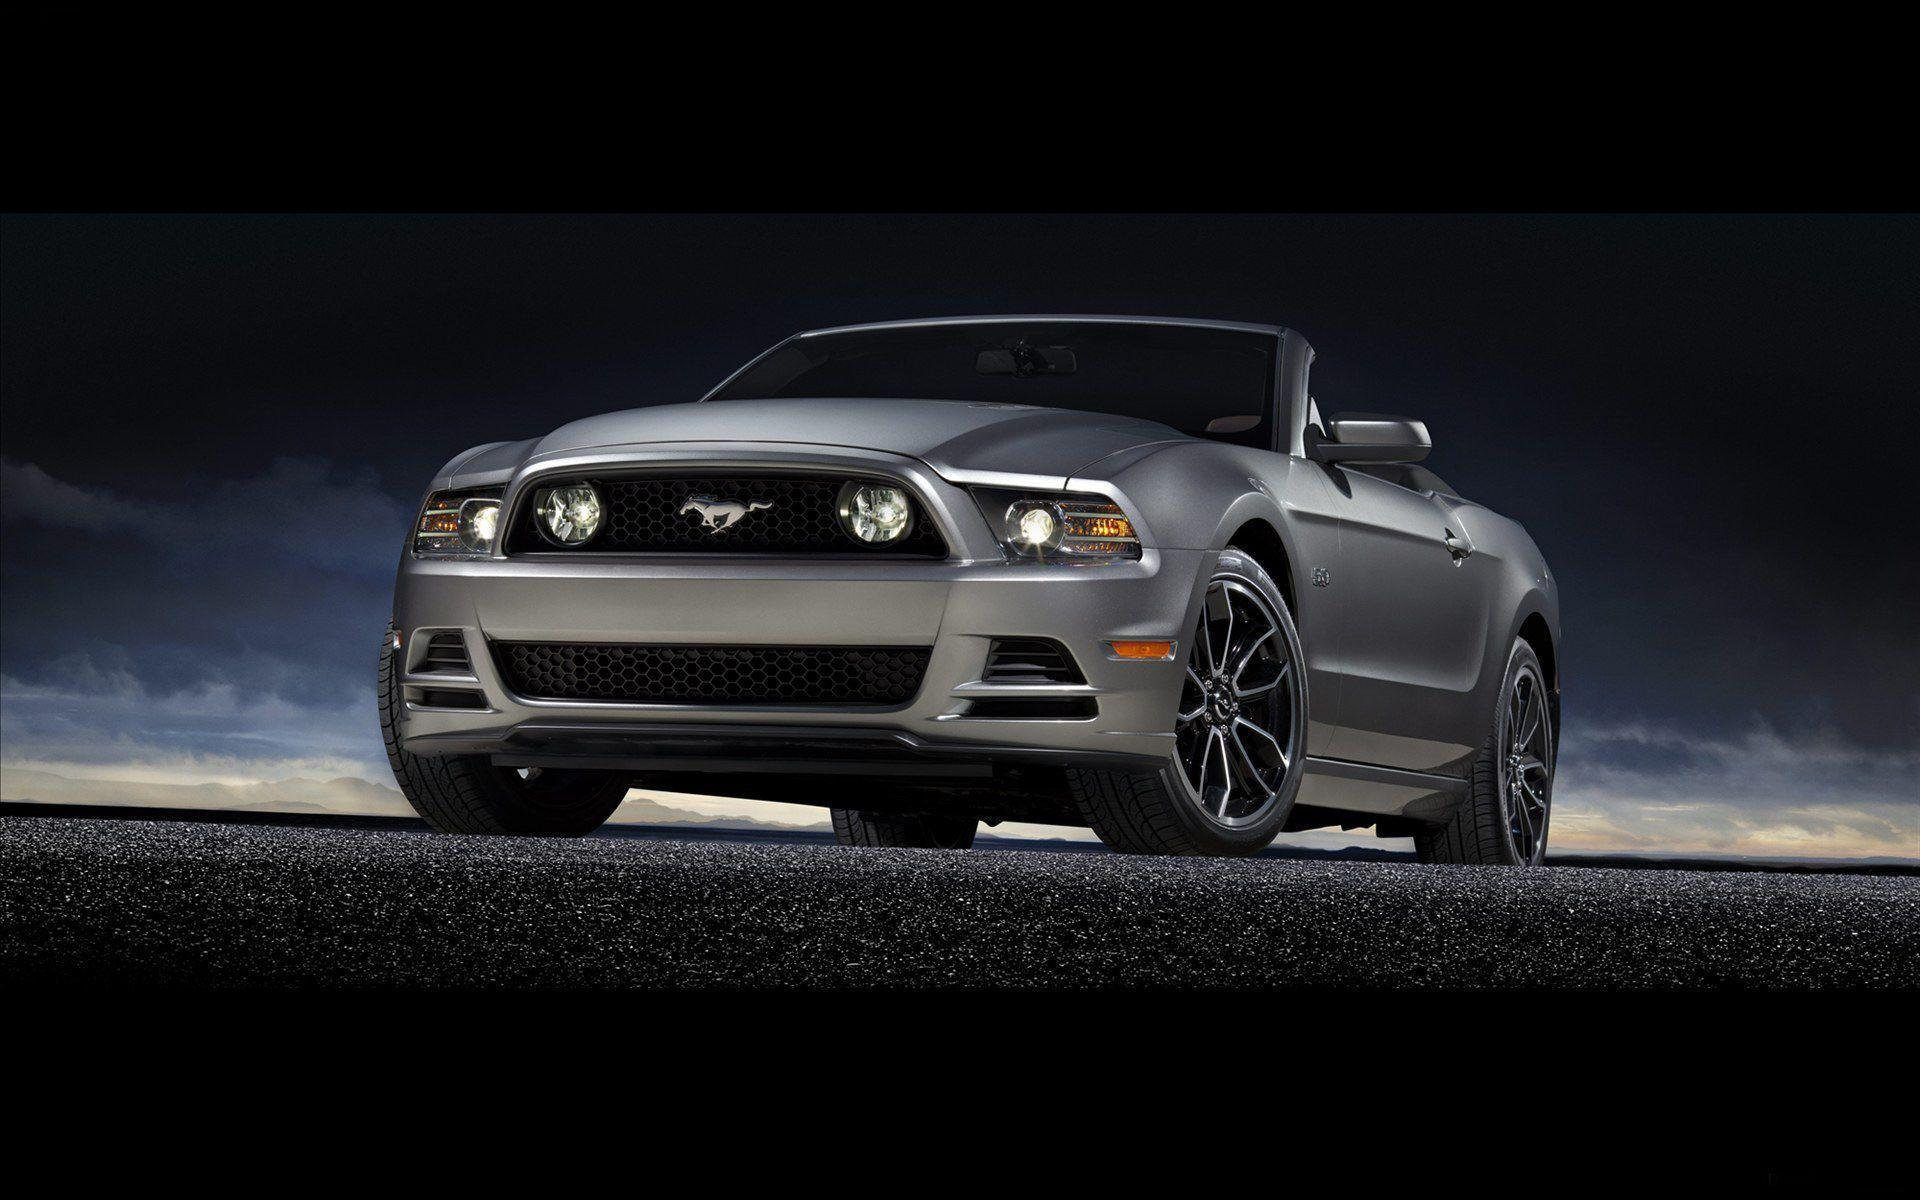 Mustang Gt Logo Hd Wallpapers Wallpaper Cave